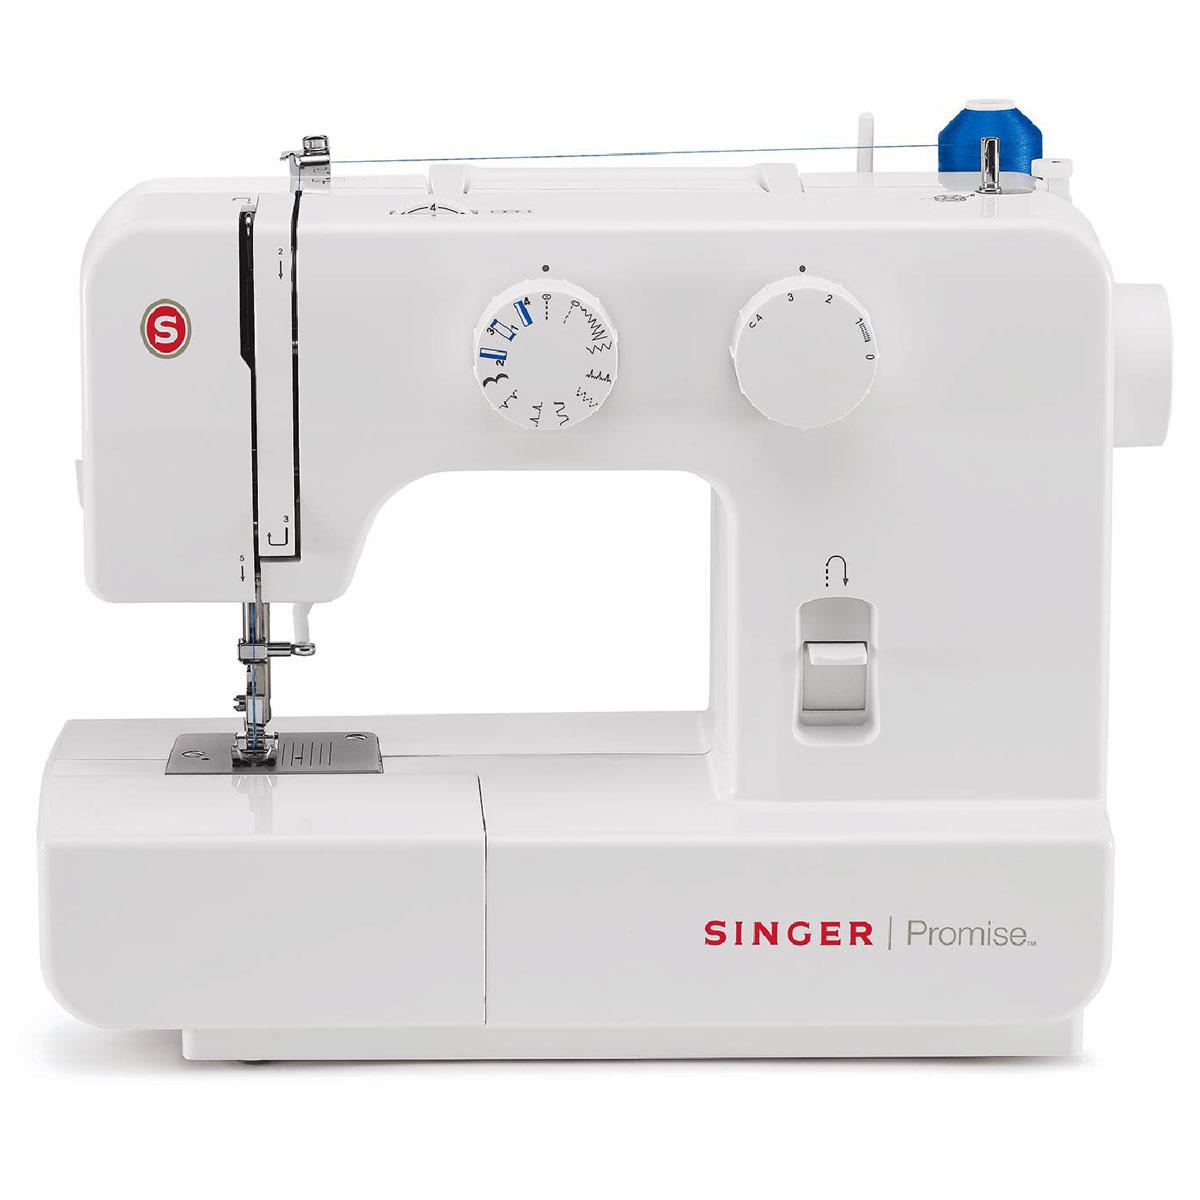 SINGER SEWING MACHINE SPOOL PIN FOR SINGER 5532